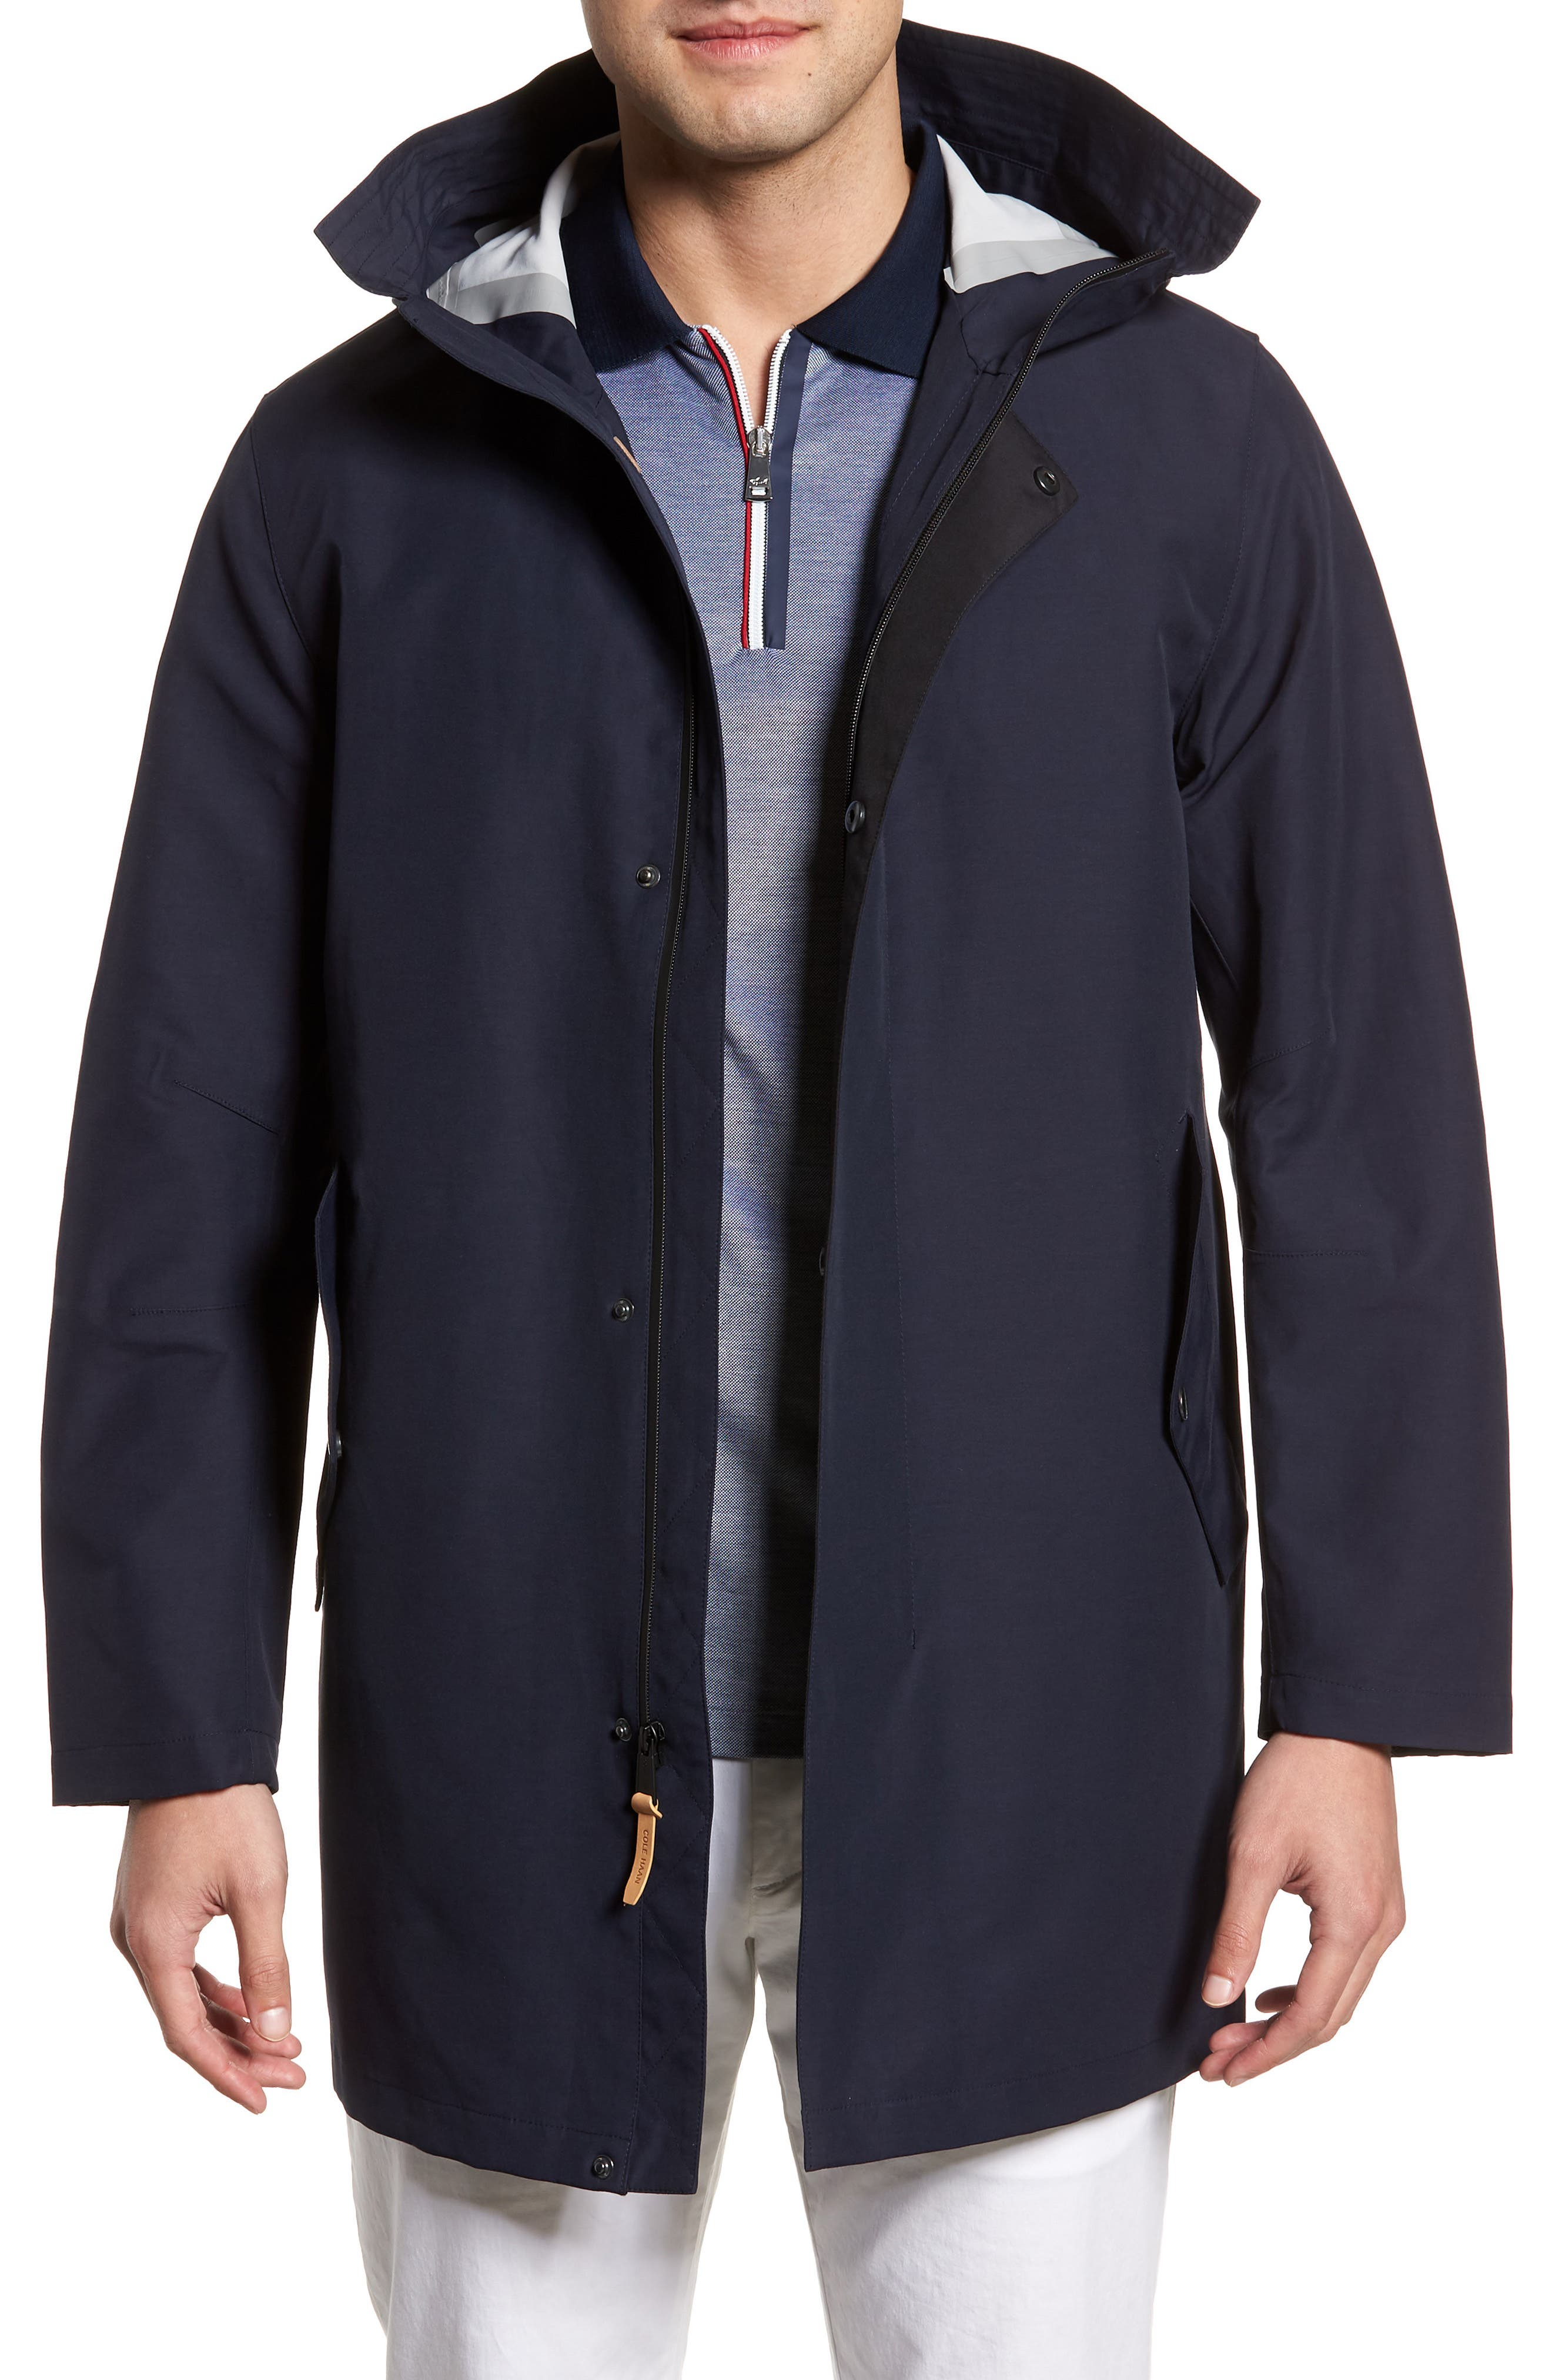 Bonded Cotton Blend Rain Jacket,                             Main thumbnail 1, color,                             NAVY